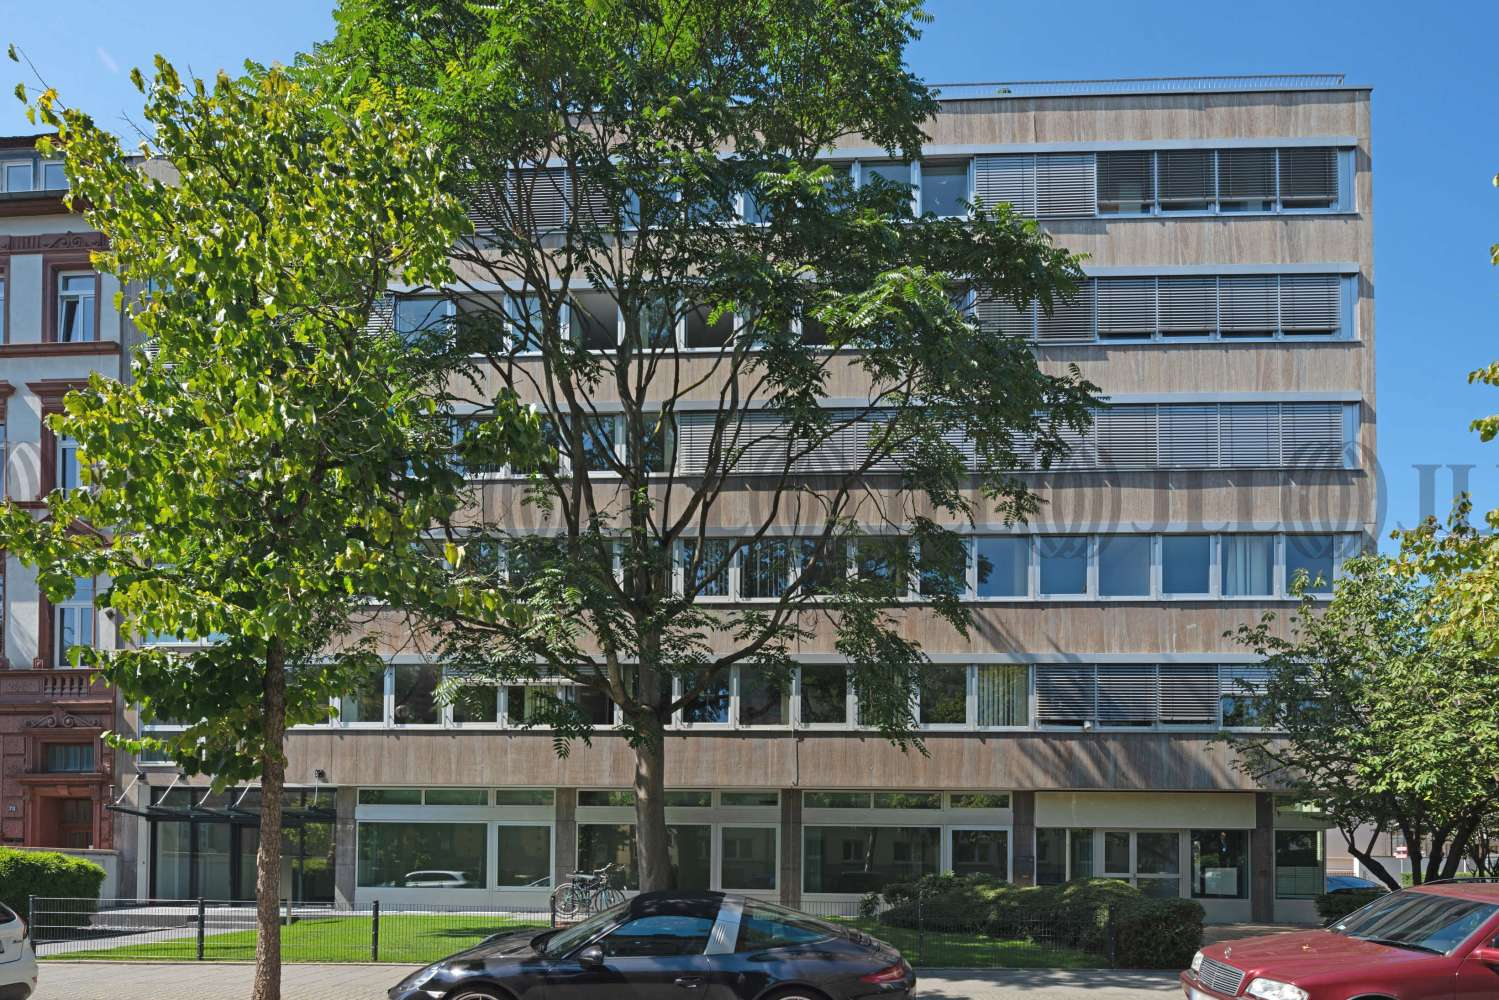 Büros Frankfurt am main, 60325 - Büro - Frankfurt am Main, Westend-Süd - F1483 - 10885335